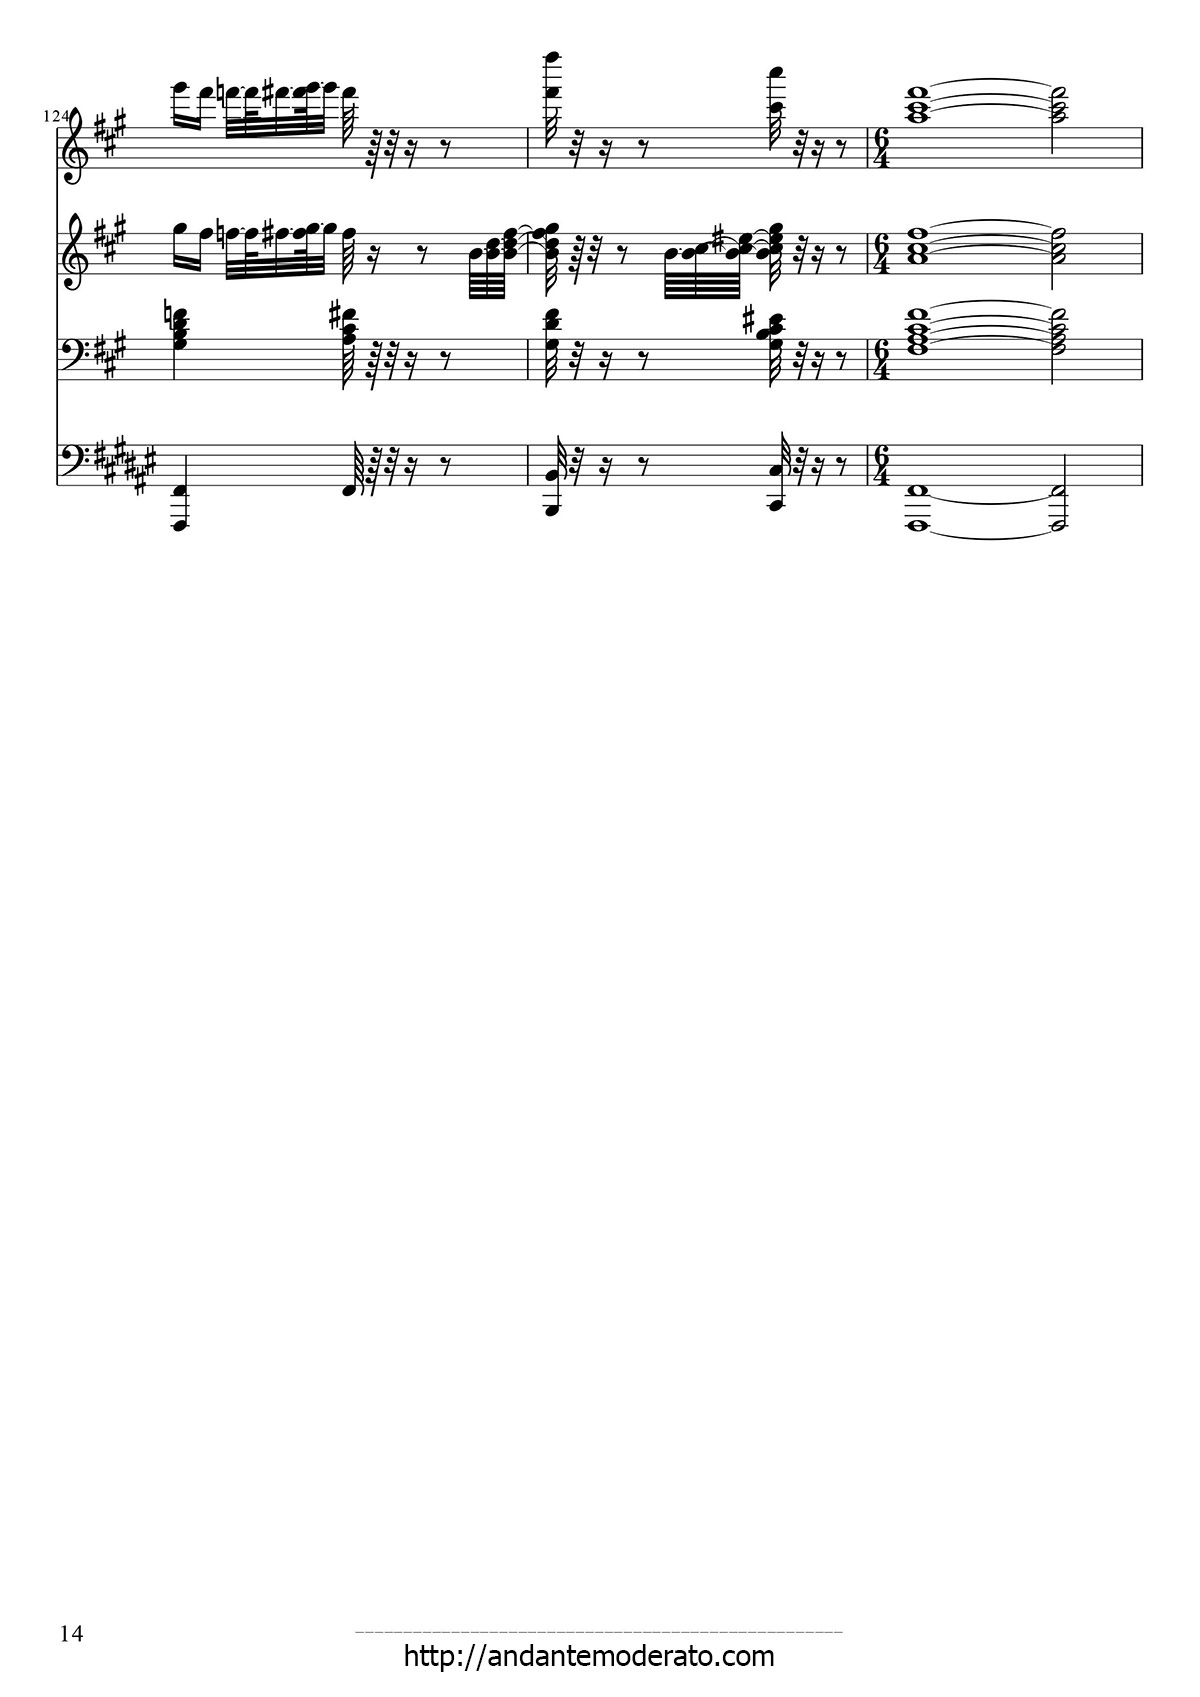 Johannes Brahms Hungarian Dances 5 Sheet 14 Of 14